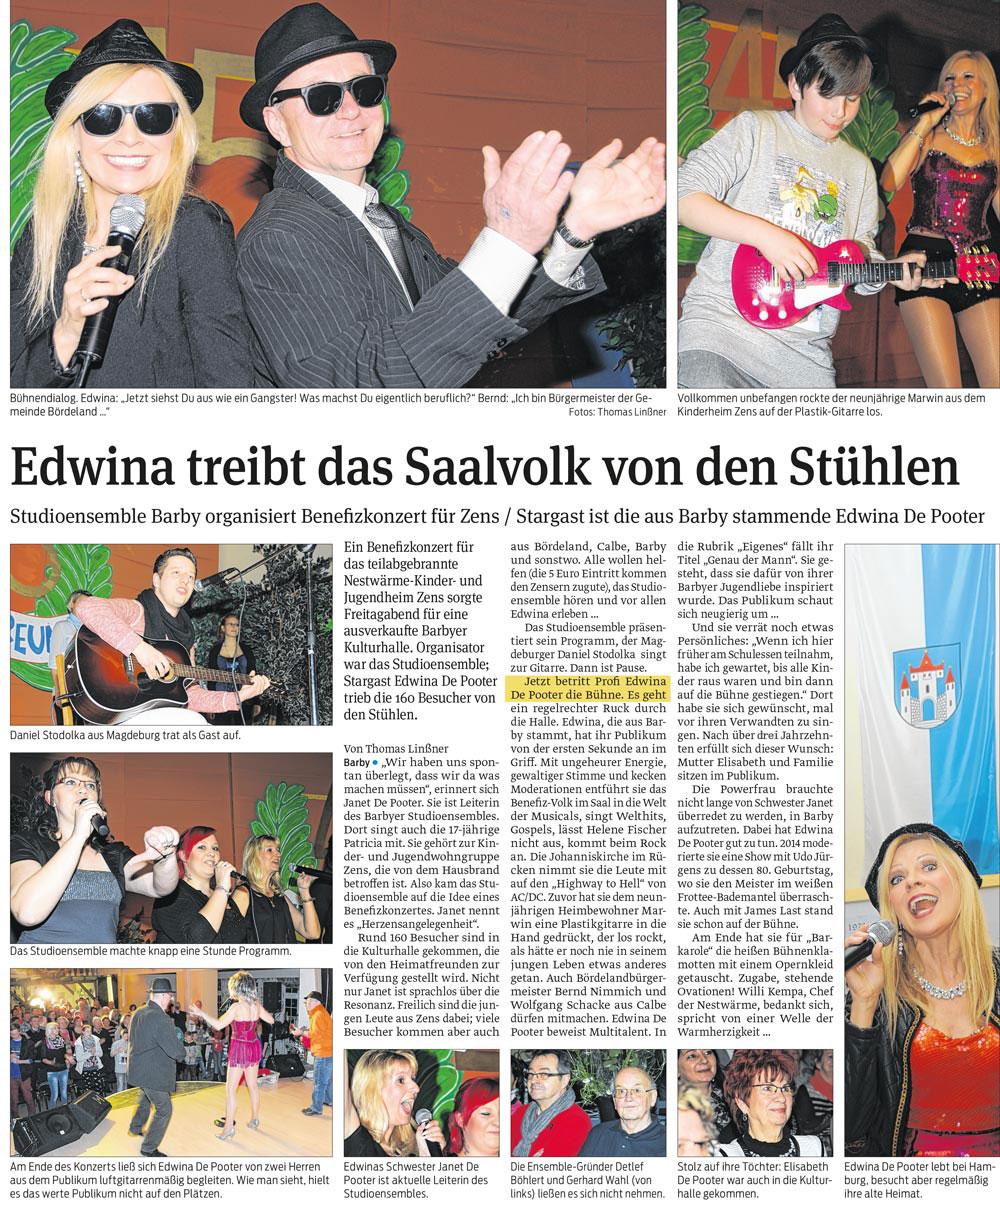 2015-03-30-edwina-treibt-das-sallvolk